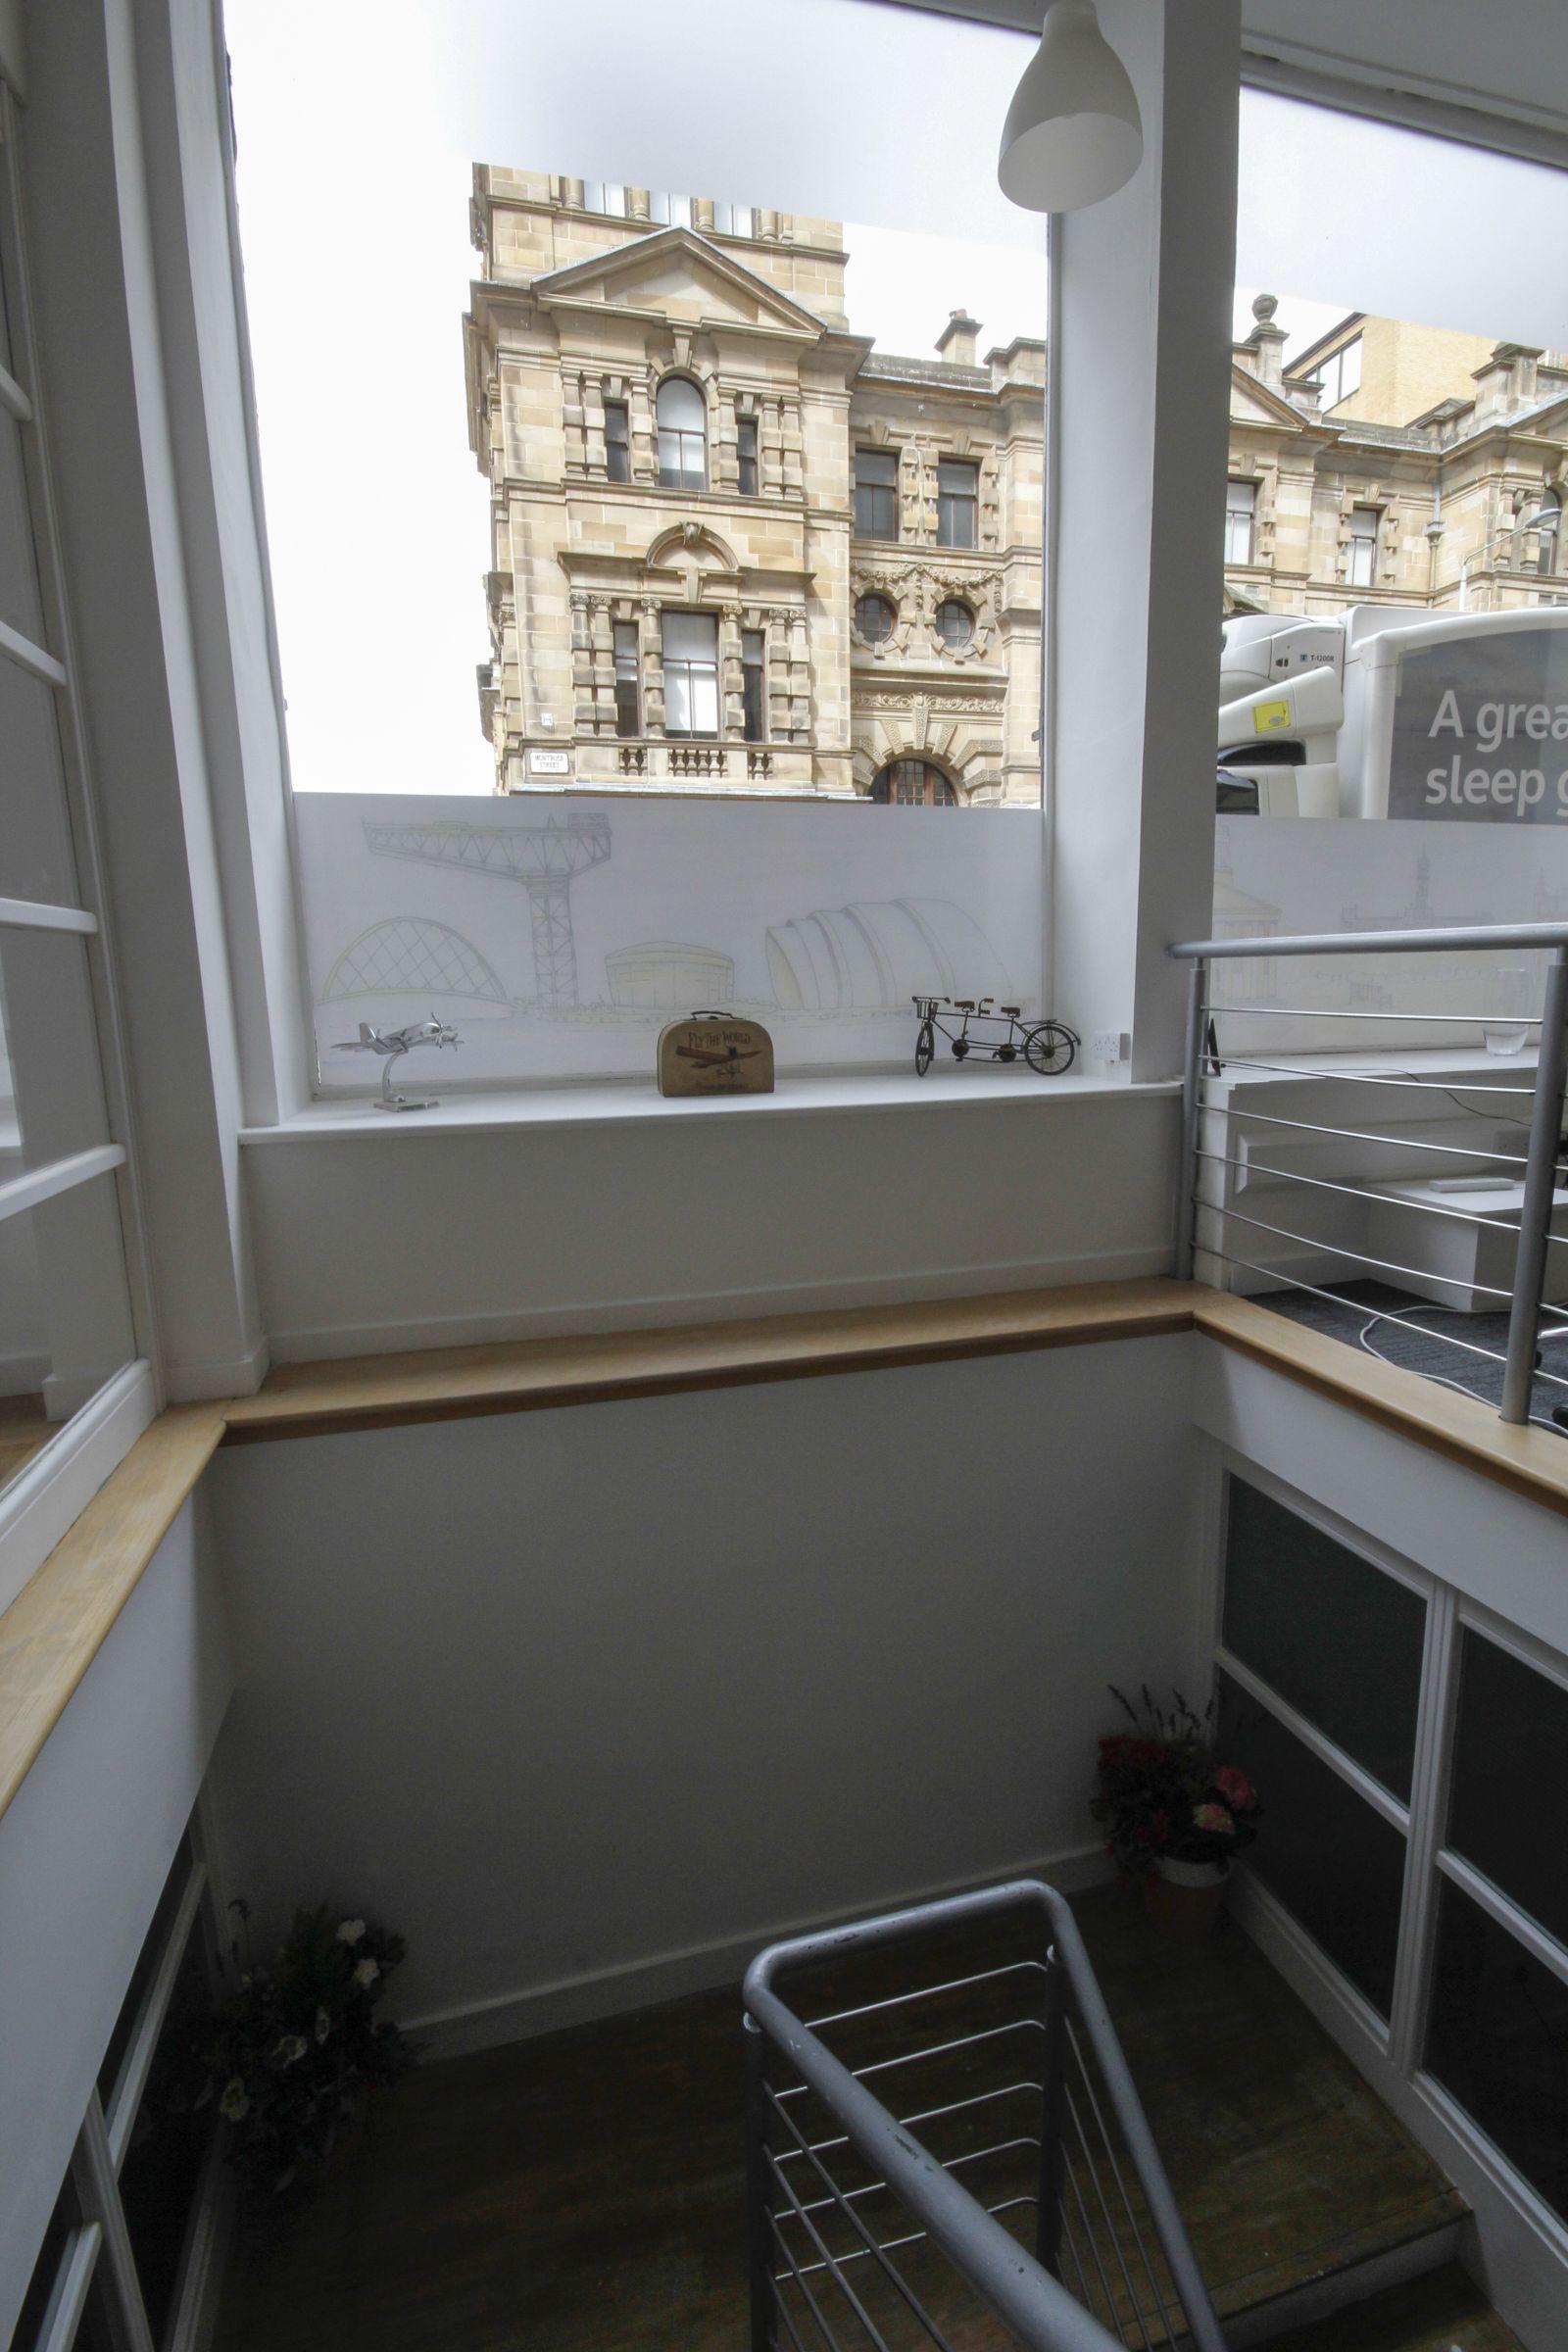 Collabor8te, Glasgow